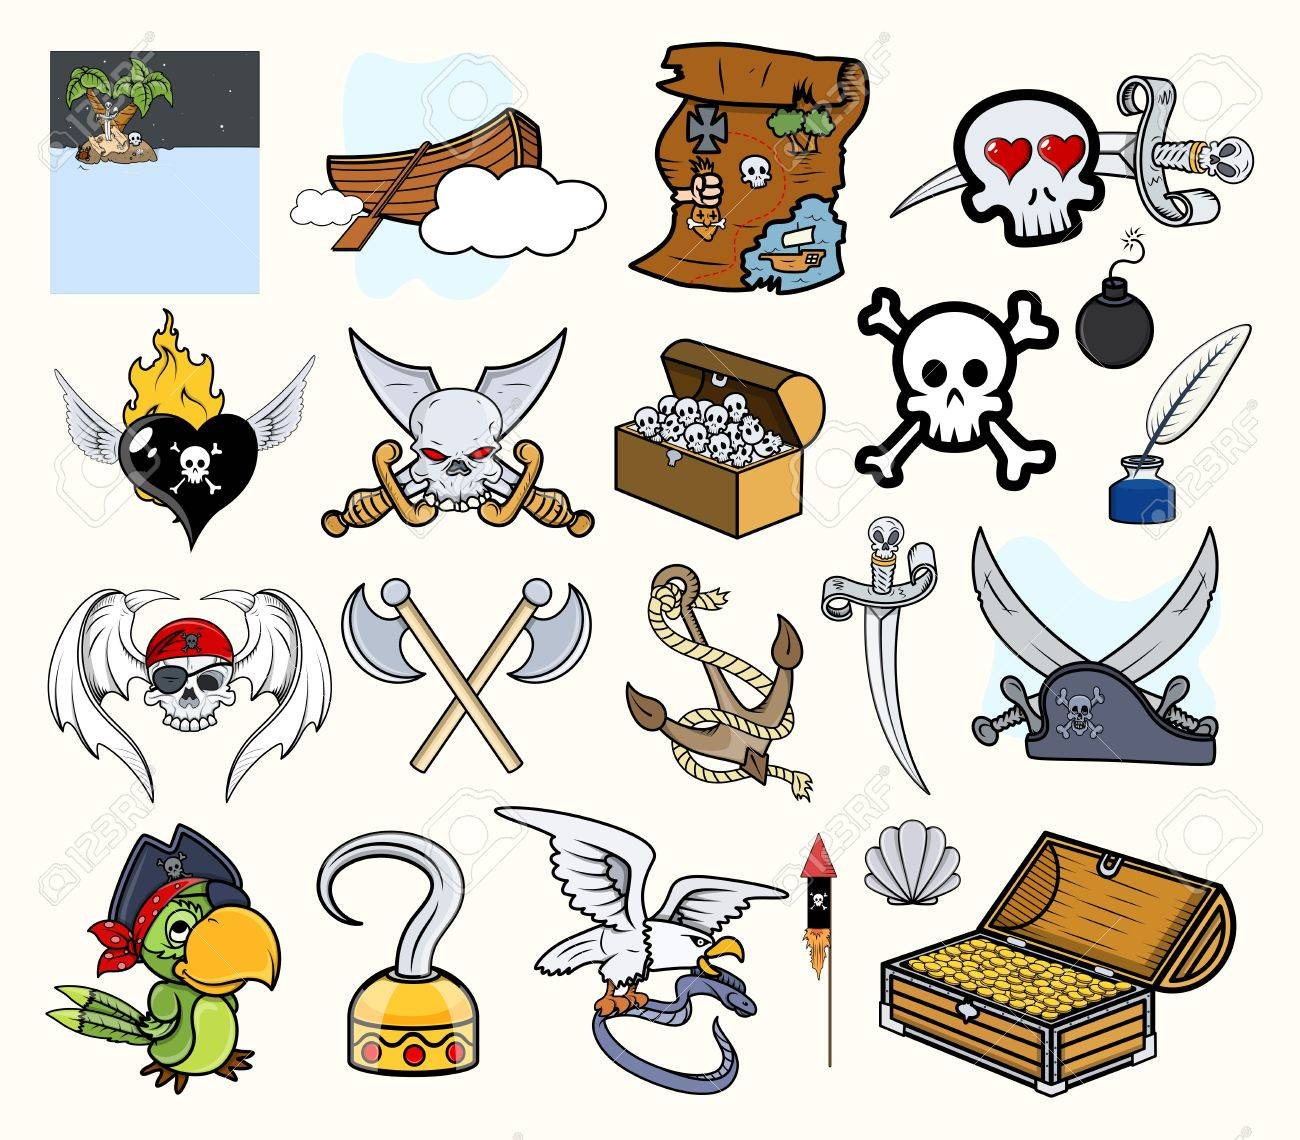 Pirate Cartoon Vectors Set Stock Vector - 21505904